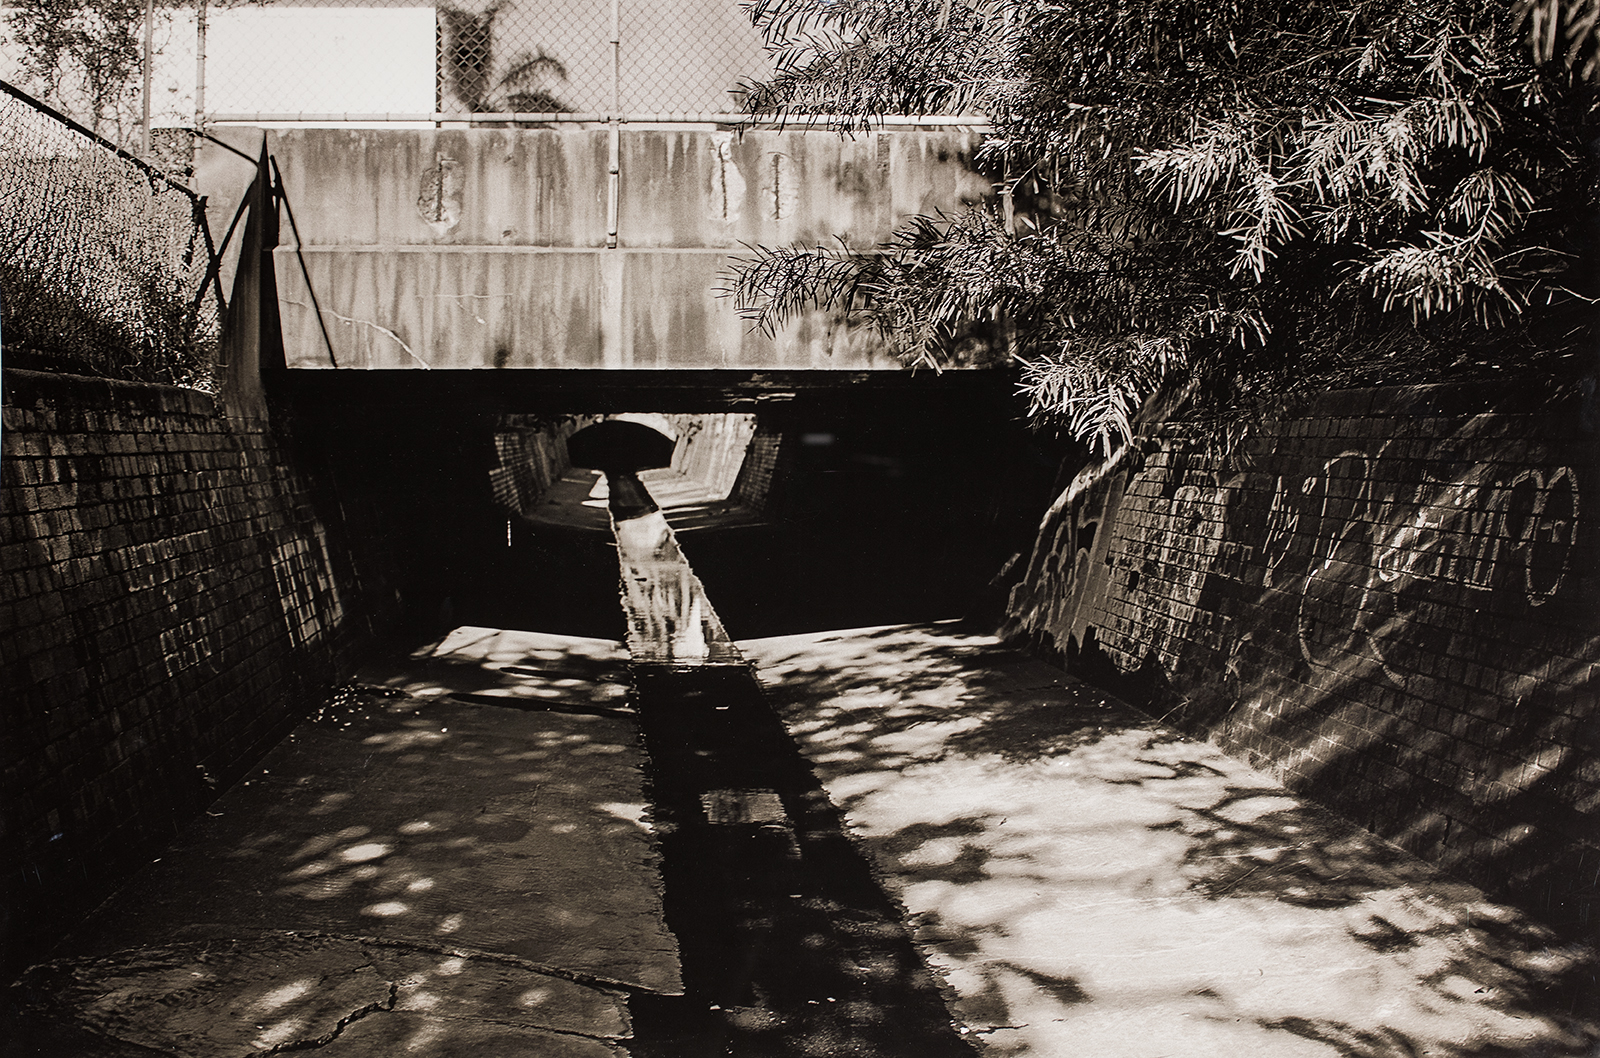 Simryn Gill, Untitled (bridge over stormwater drain, Sydney), 20